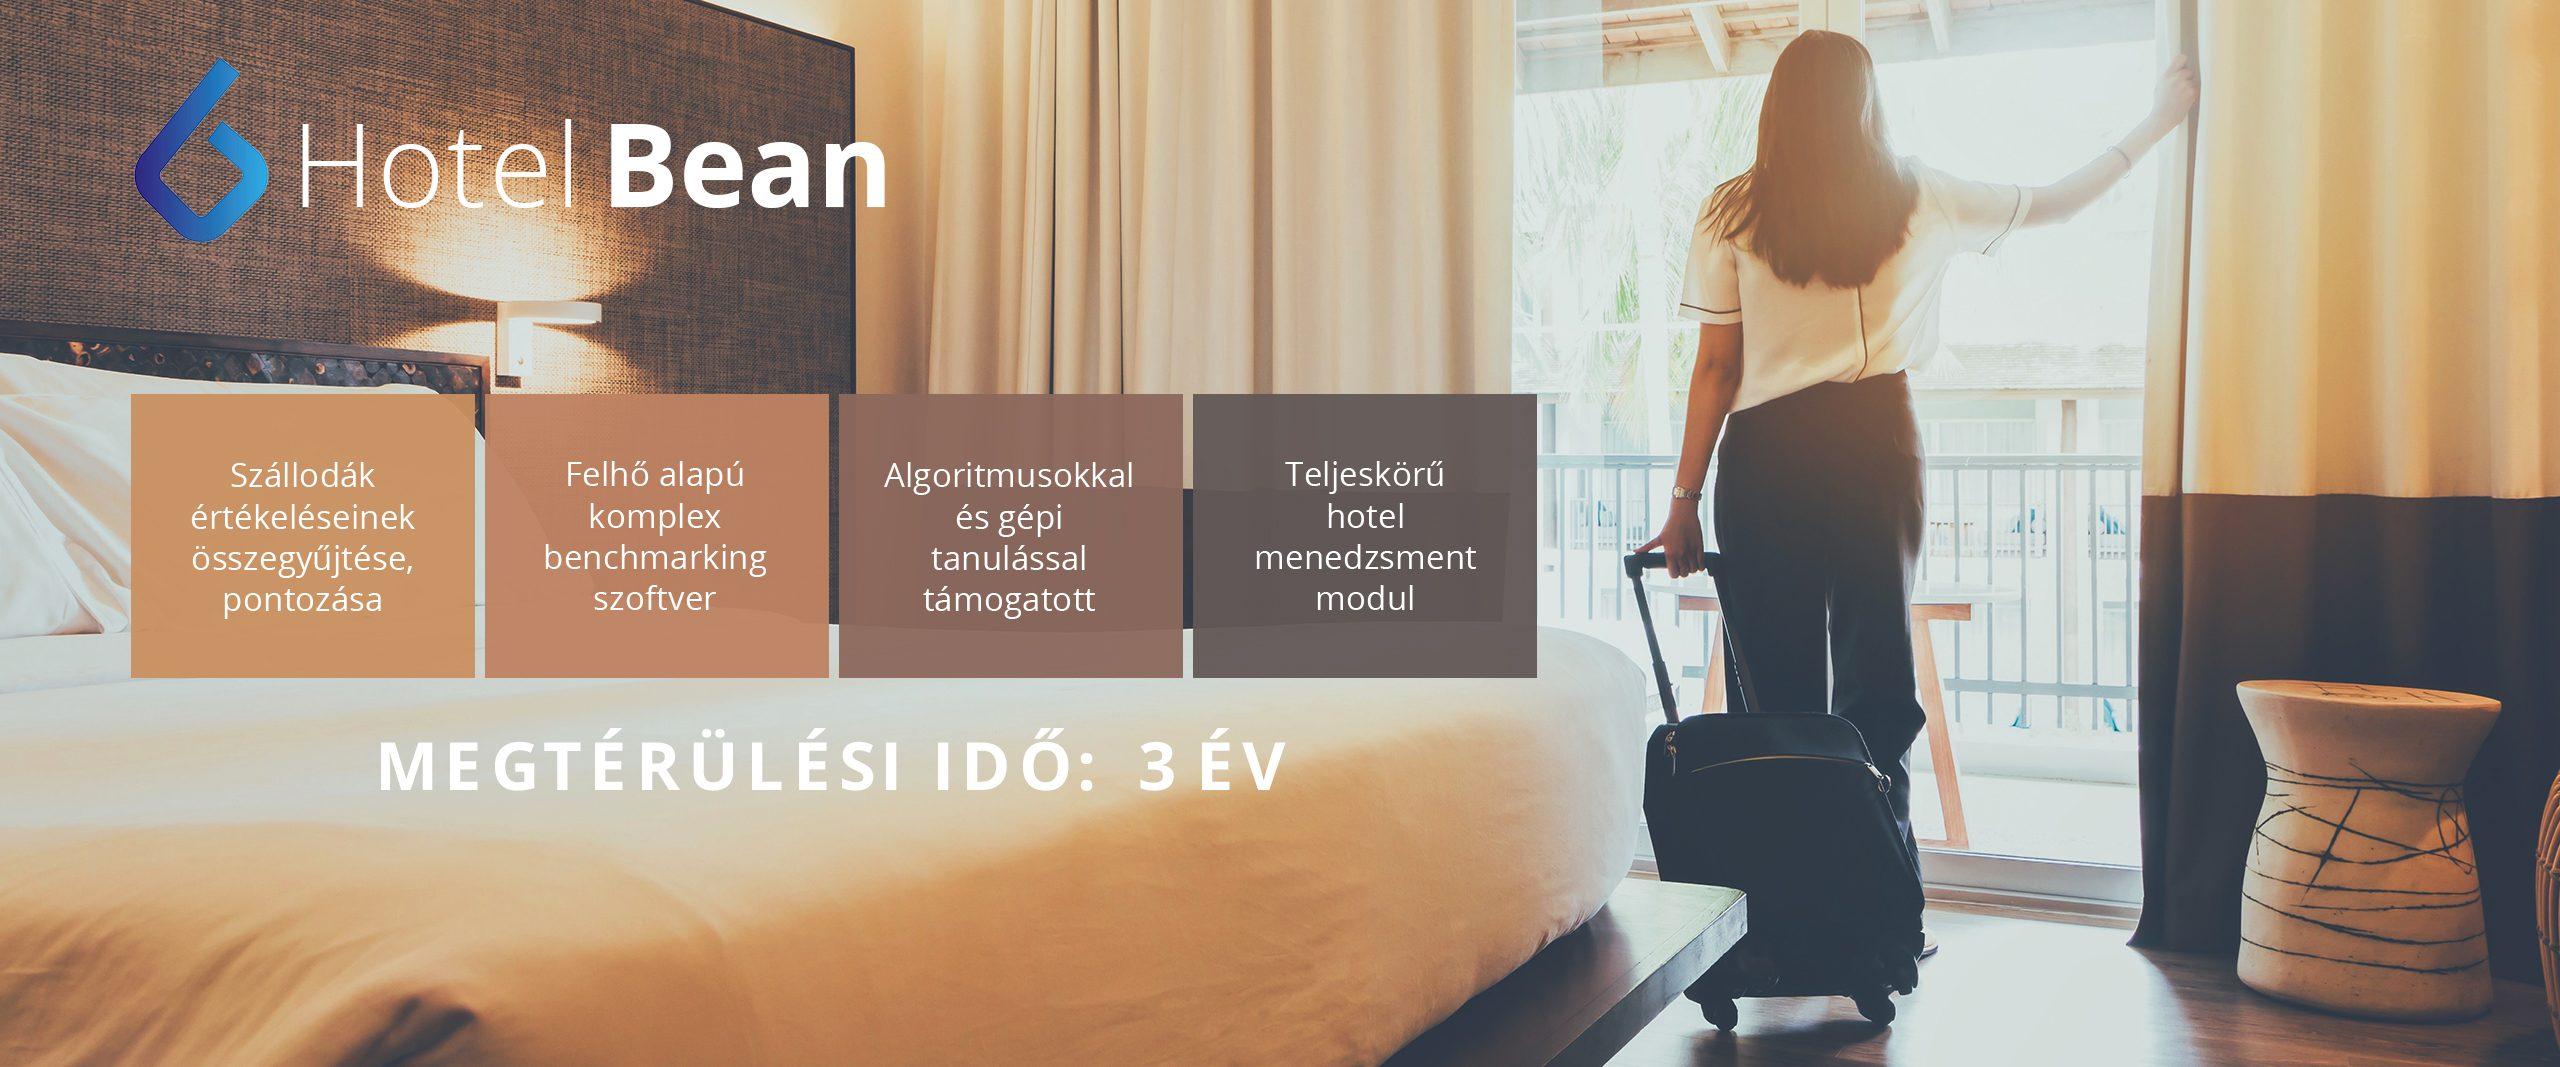 03-hotelbean-slider-desktop-b